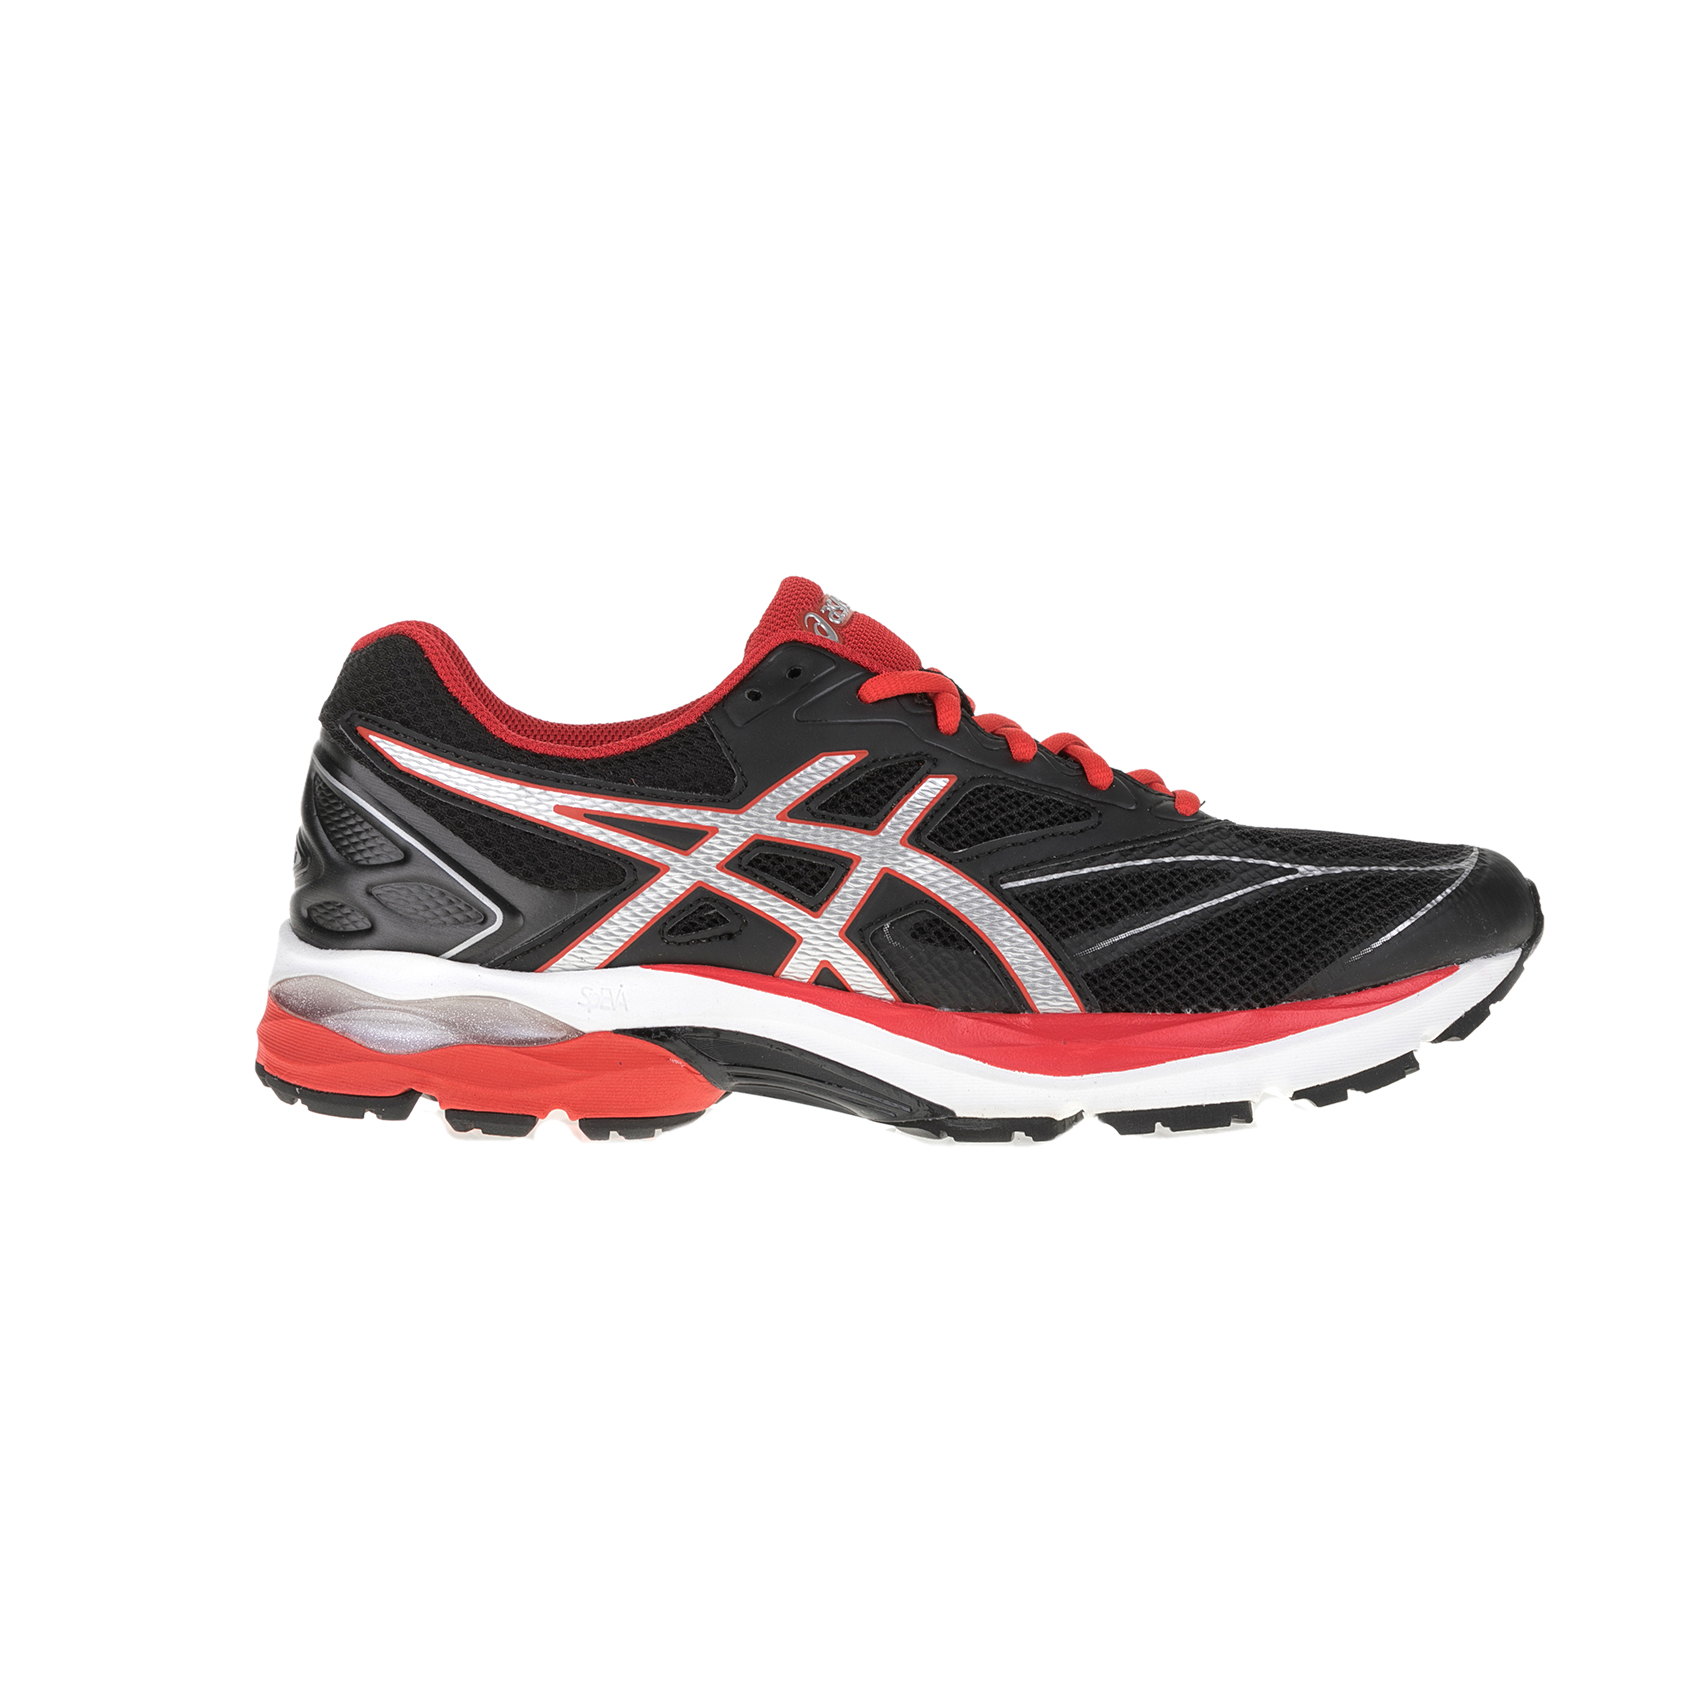 ASICS – Ανδρικά παπούτσια ASICS GEL-PULSE 8 κόκκινα